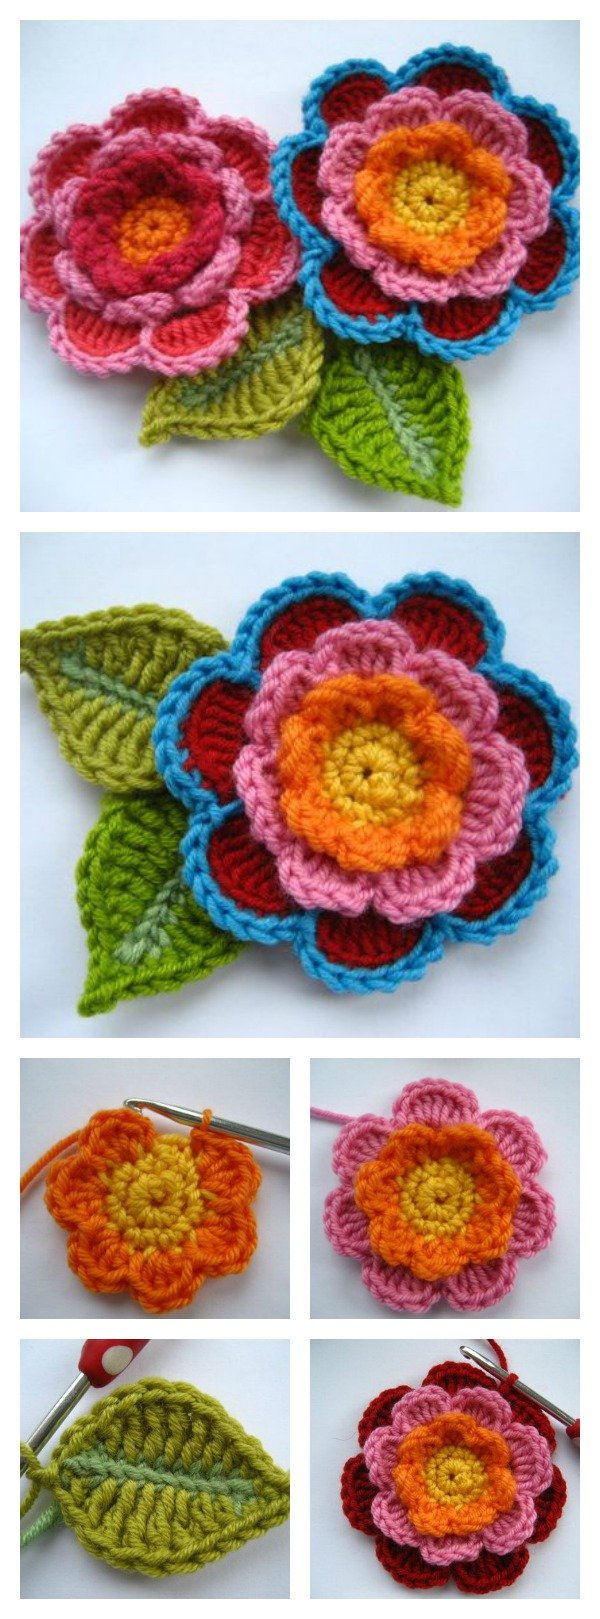 Crochet Beautiful Triple Layer Flower Free Pattern and Tutorial